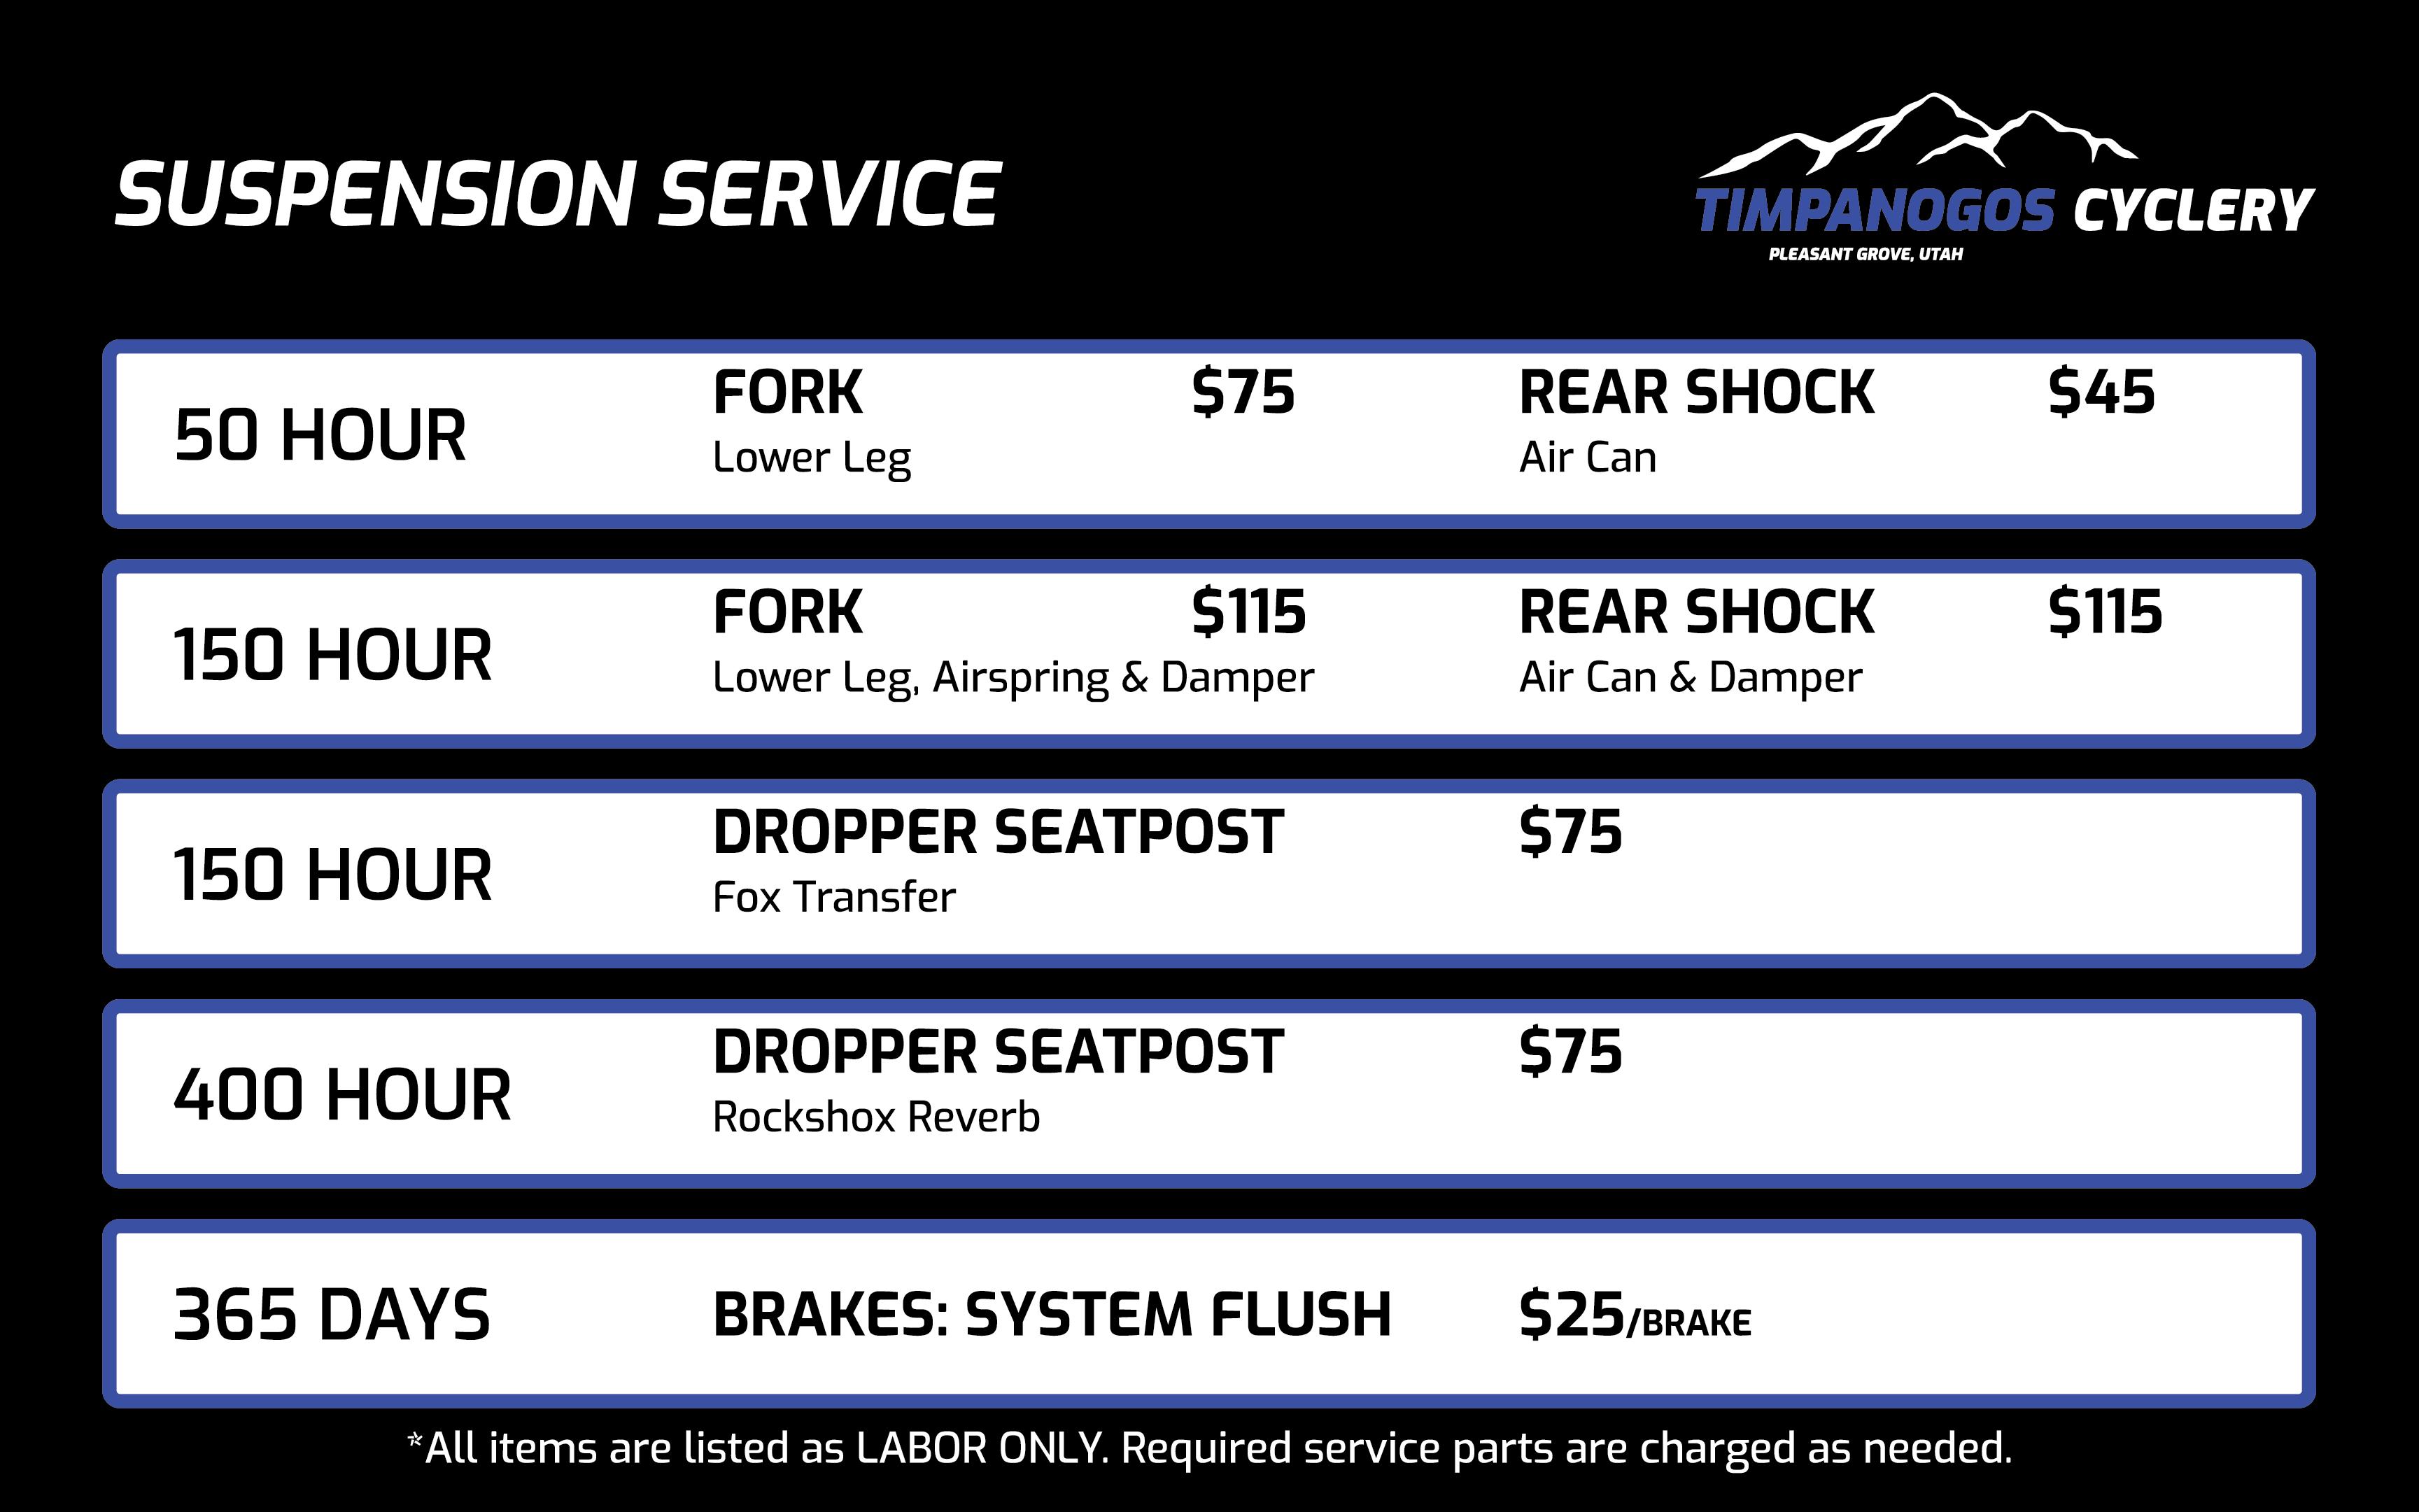 Suspension Service Prices